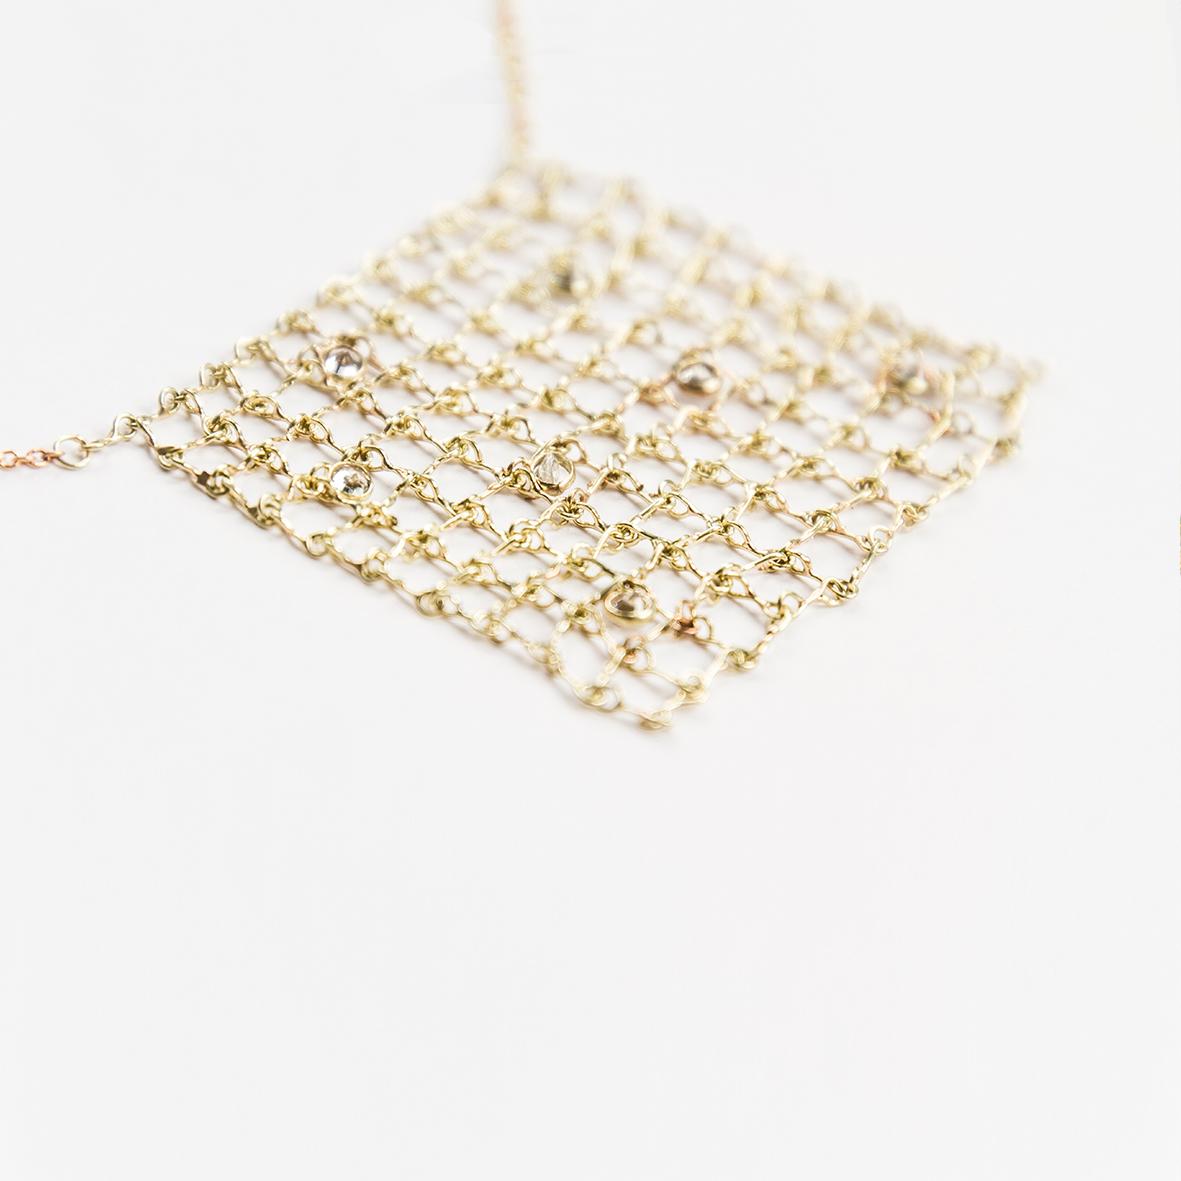 2. OONA_philo_ficha2_sapphire square net necklace